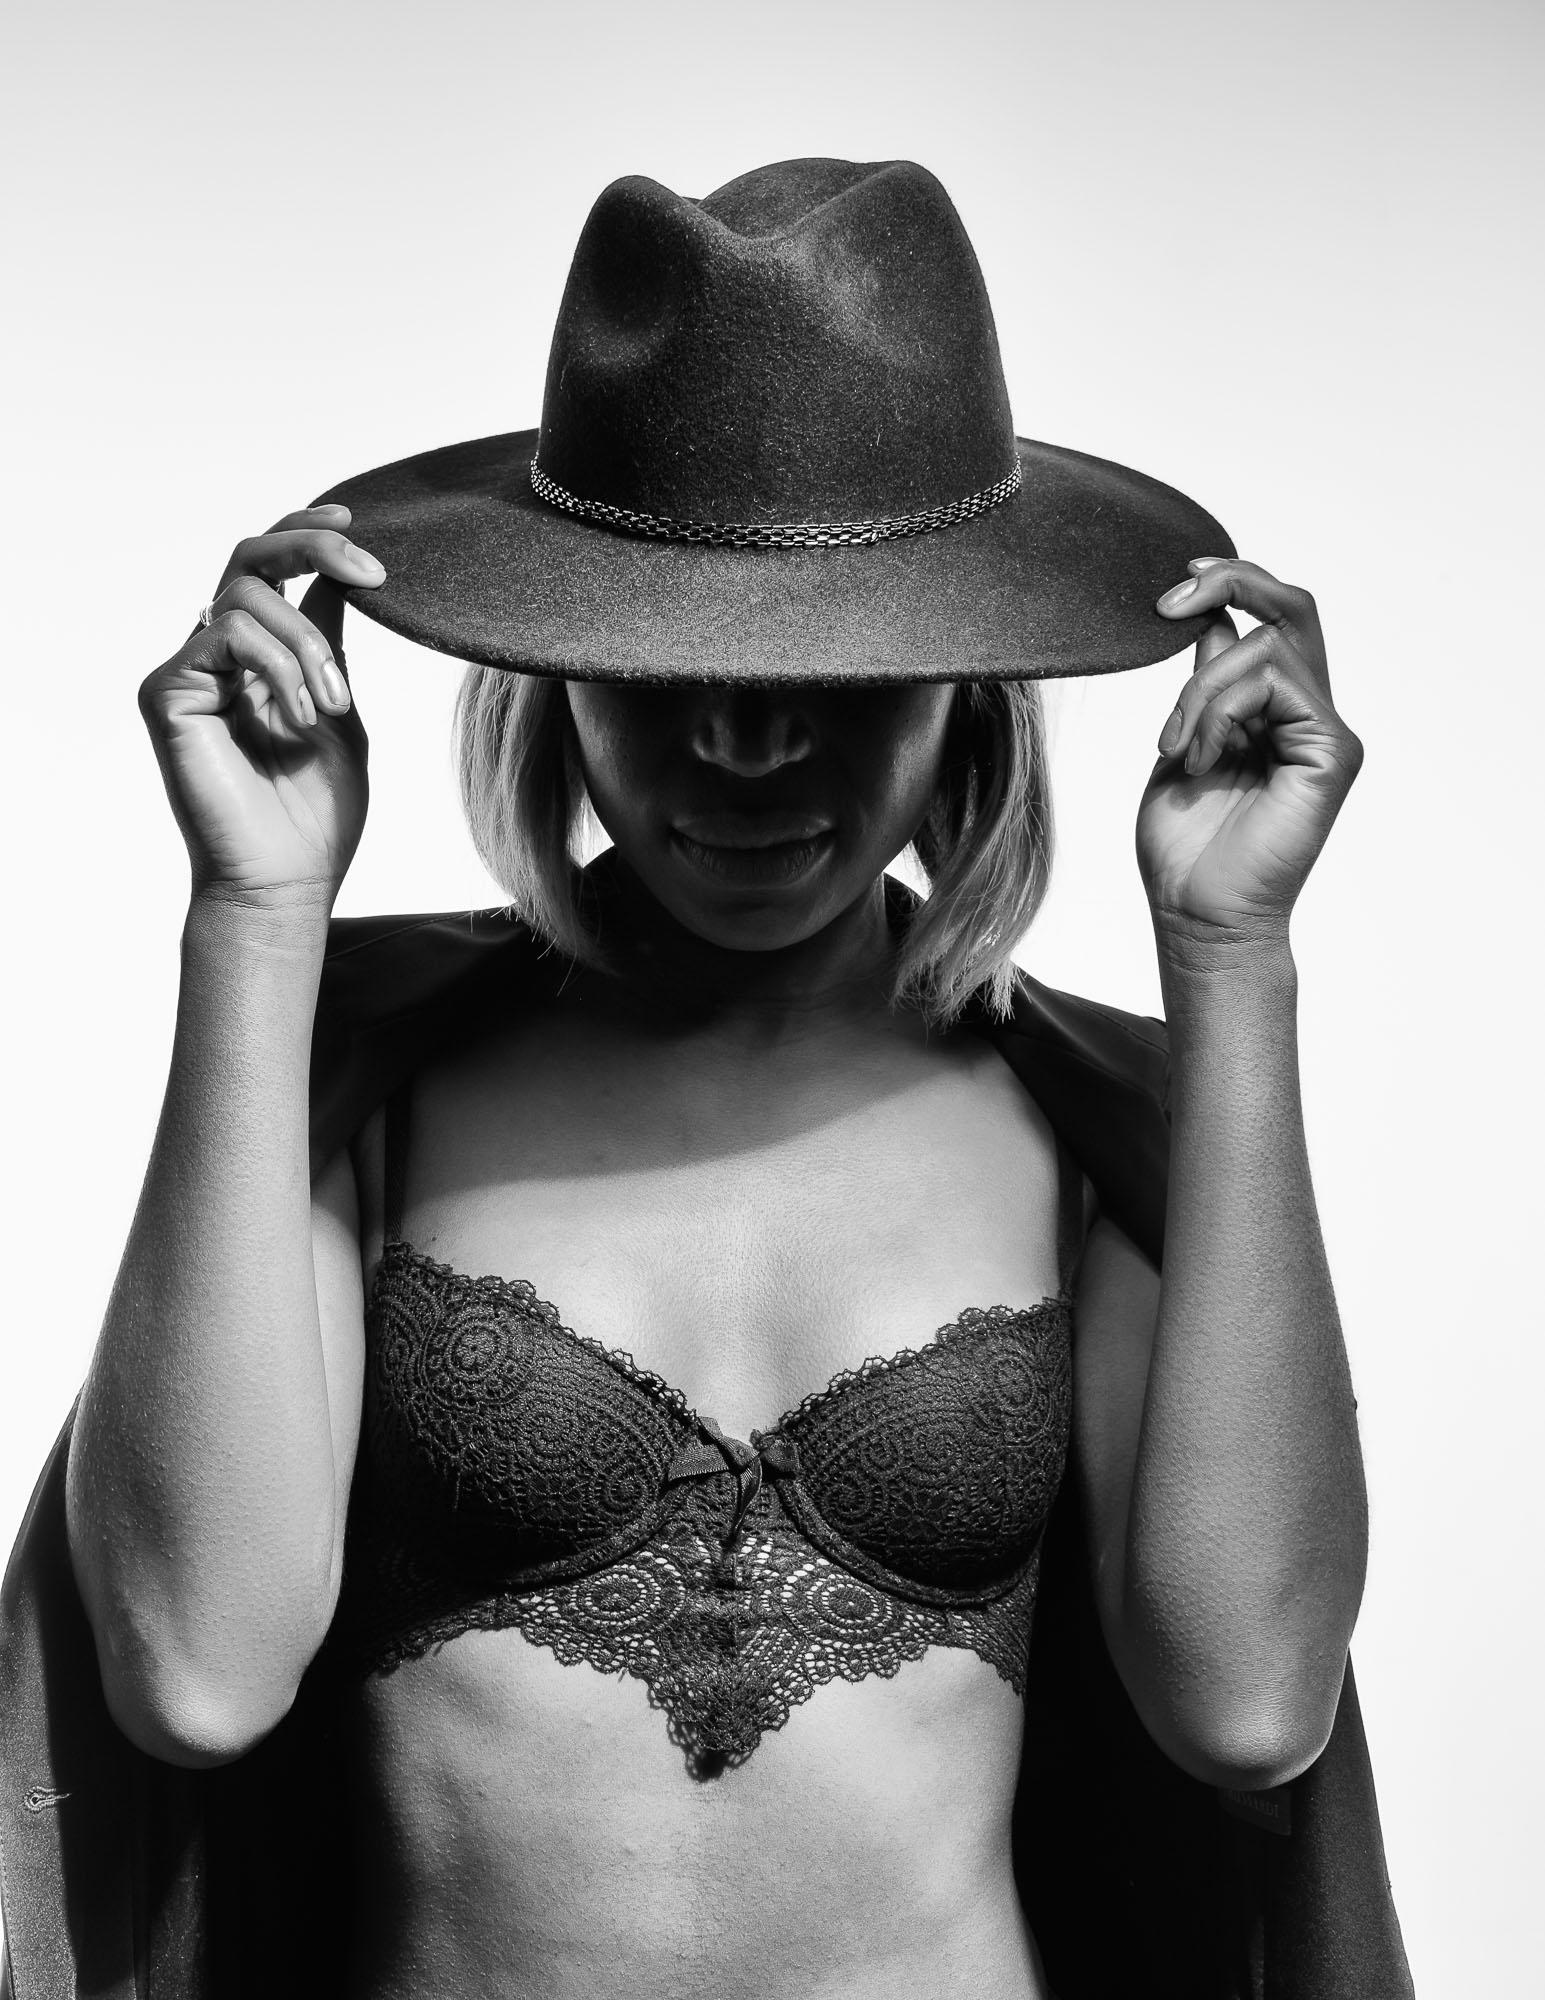 Fashion photography studio singapore services asia photographer photoshoot model underwear limgerie